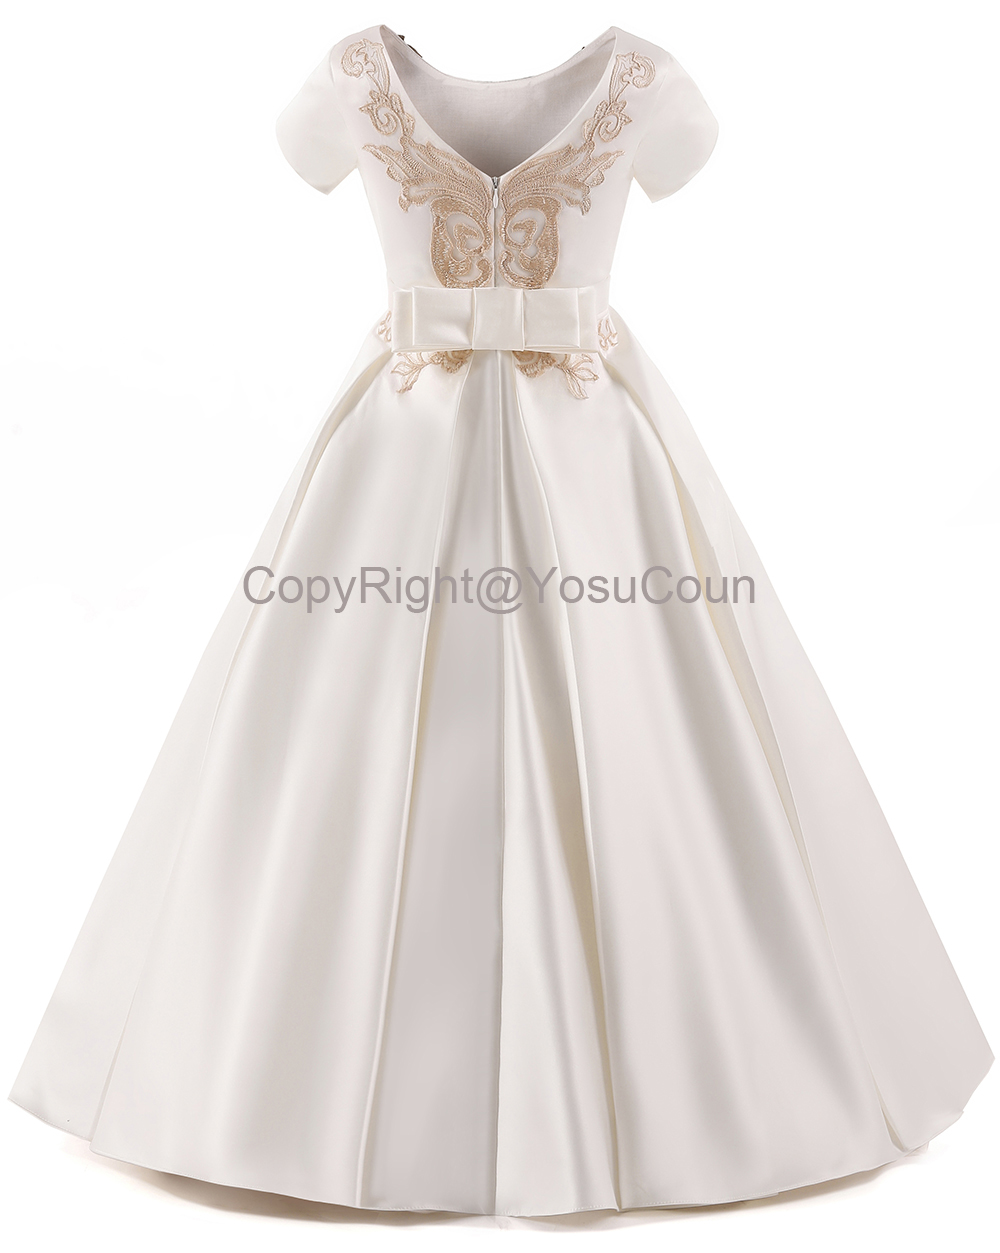 ... Children s Clothing Girl  Elegant Long Gown Party Dresses  Wedding Dress   Long Party Dress Elegant. View all specs. Product Description. 1 2. 3 4 5  ... 2a8a400a8e9c